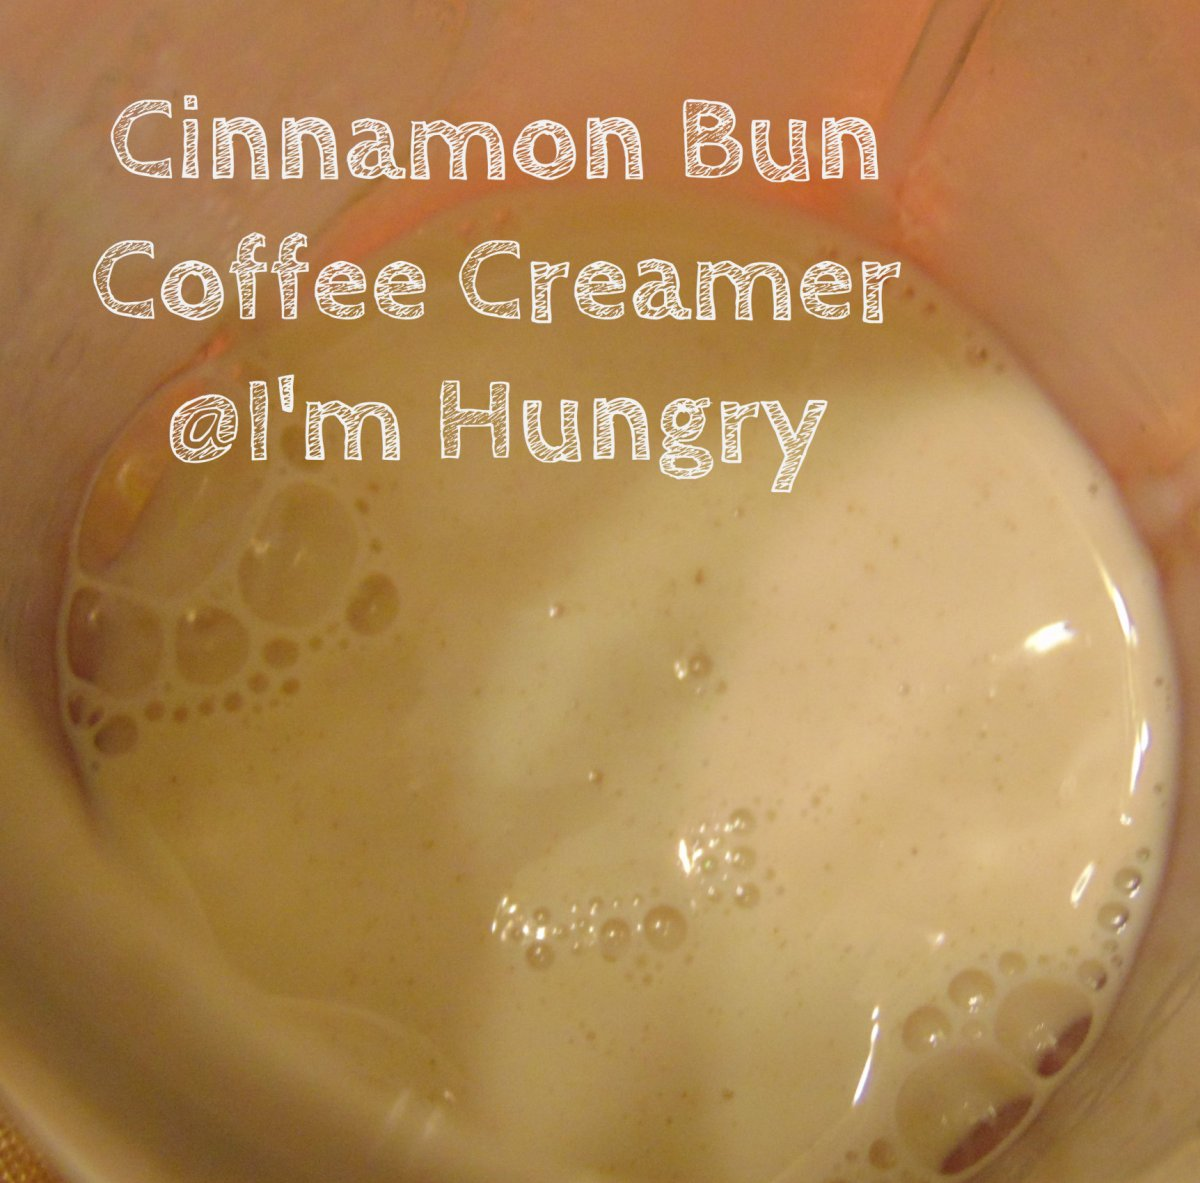 Cinnamon Bun CoffeeCreamer